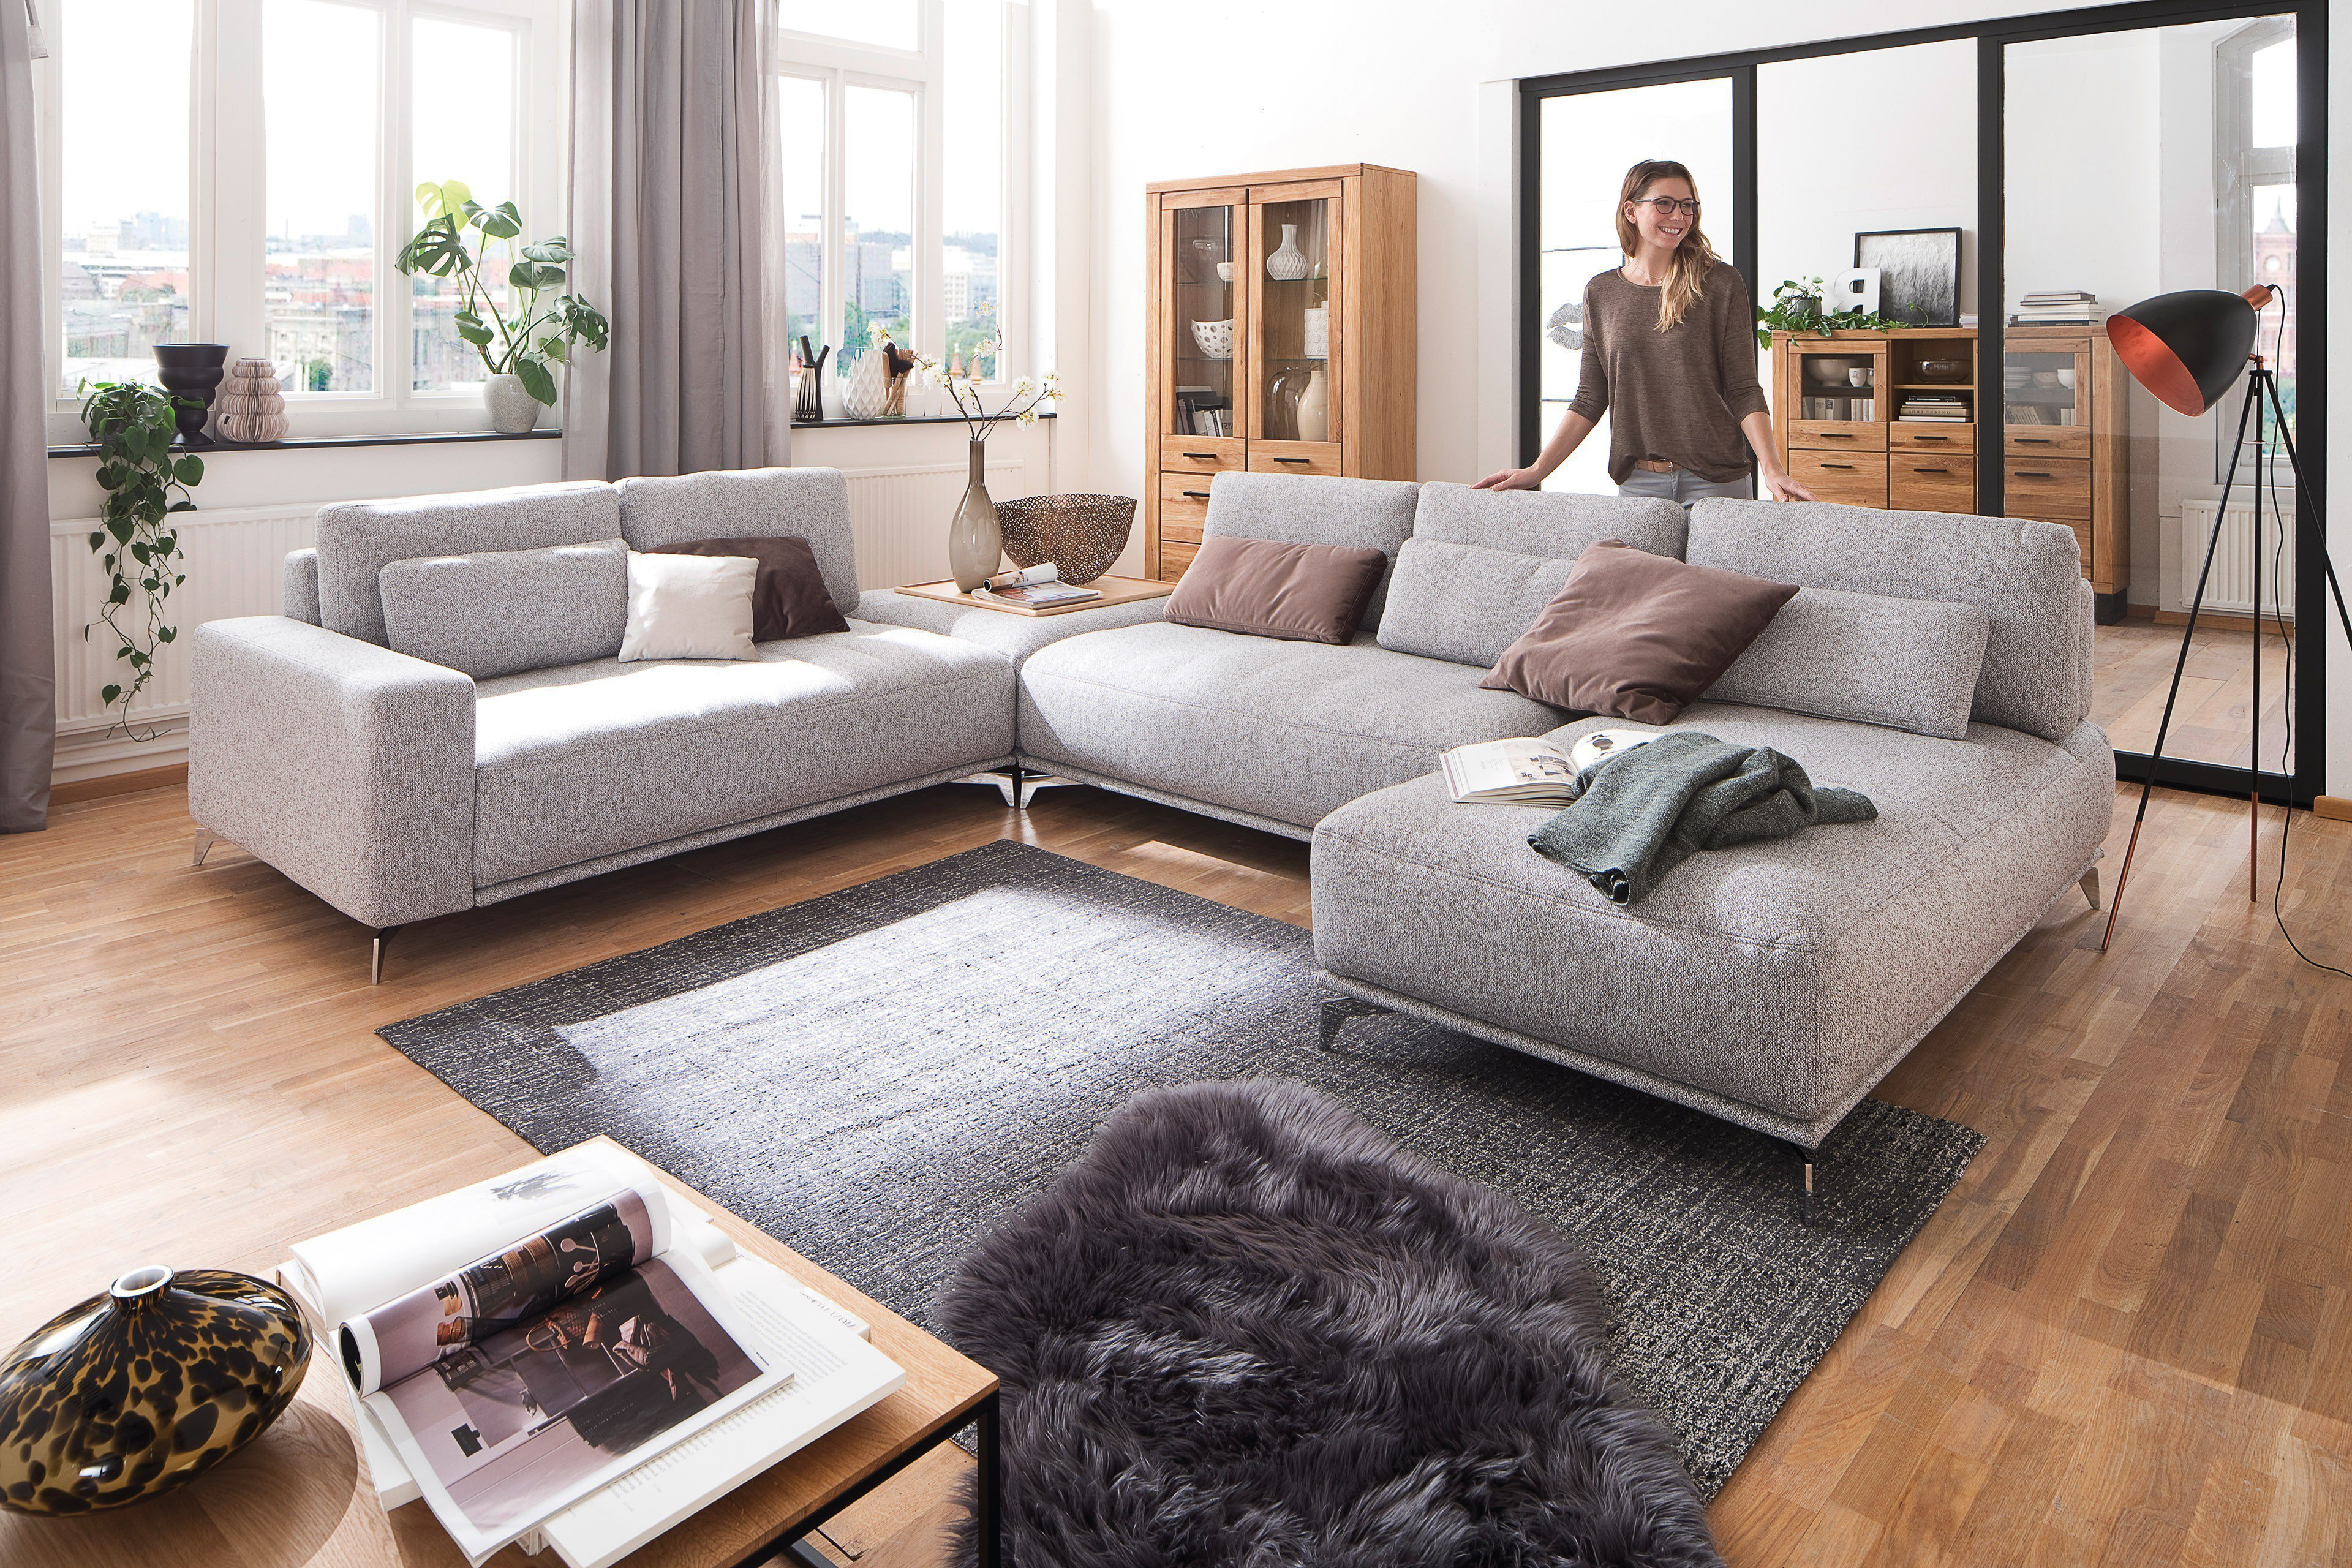 poco polsterm bel salerno xxl sofa in creme m bel letz ihr online shop. Black Bedroom Furniture Sets. Home Design Ideas